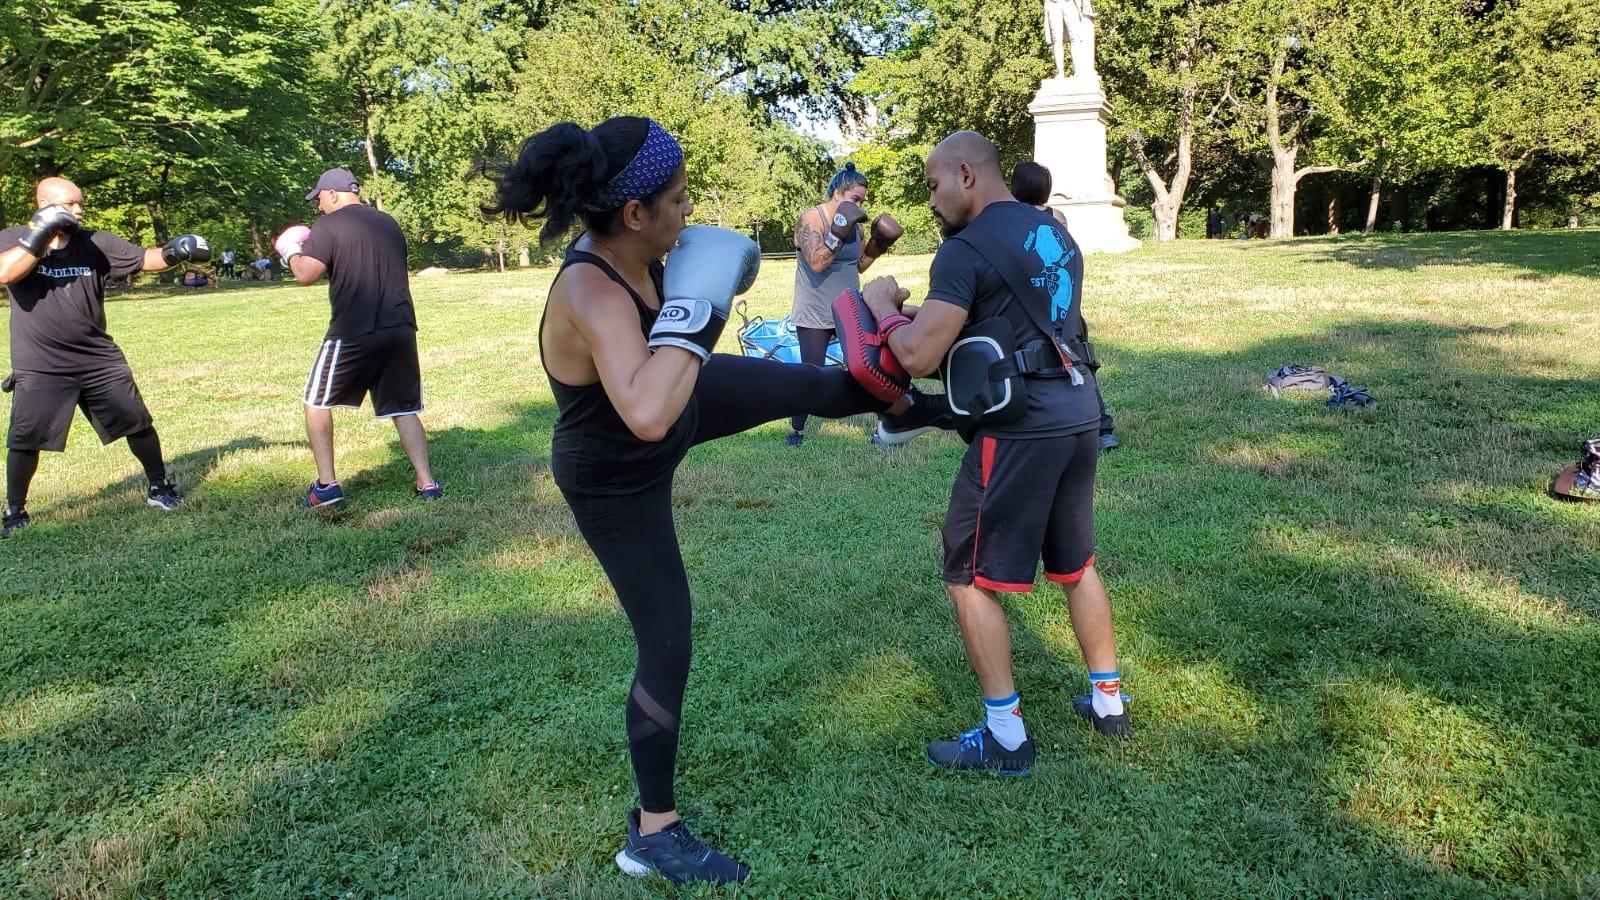 Kickboxing Conditioning (Muay Thai)